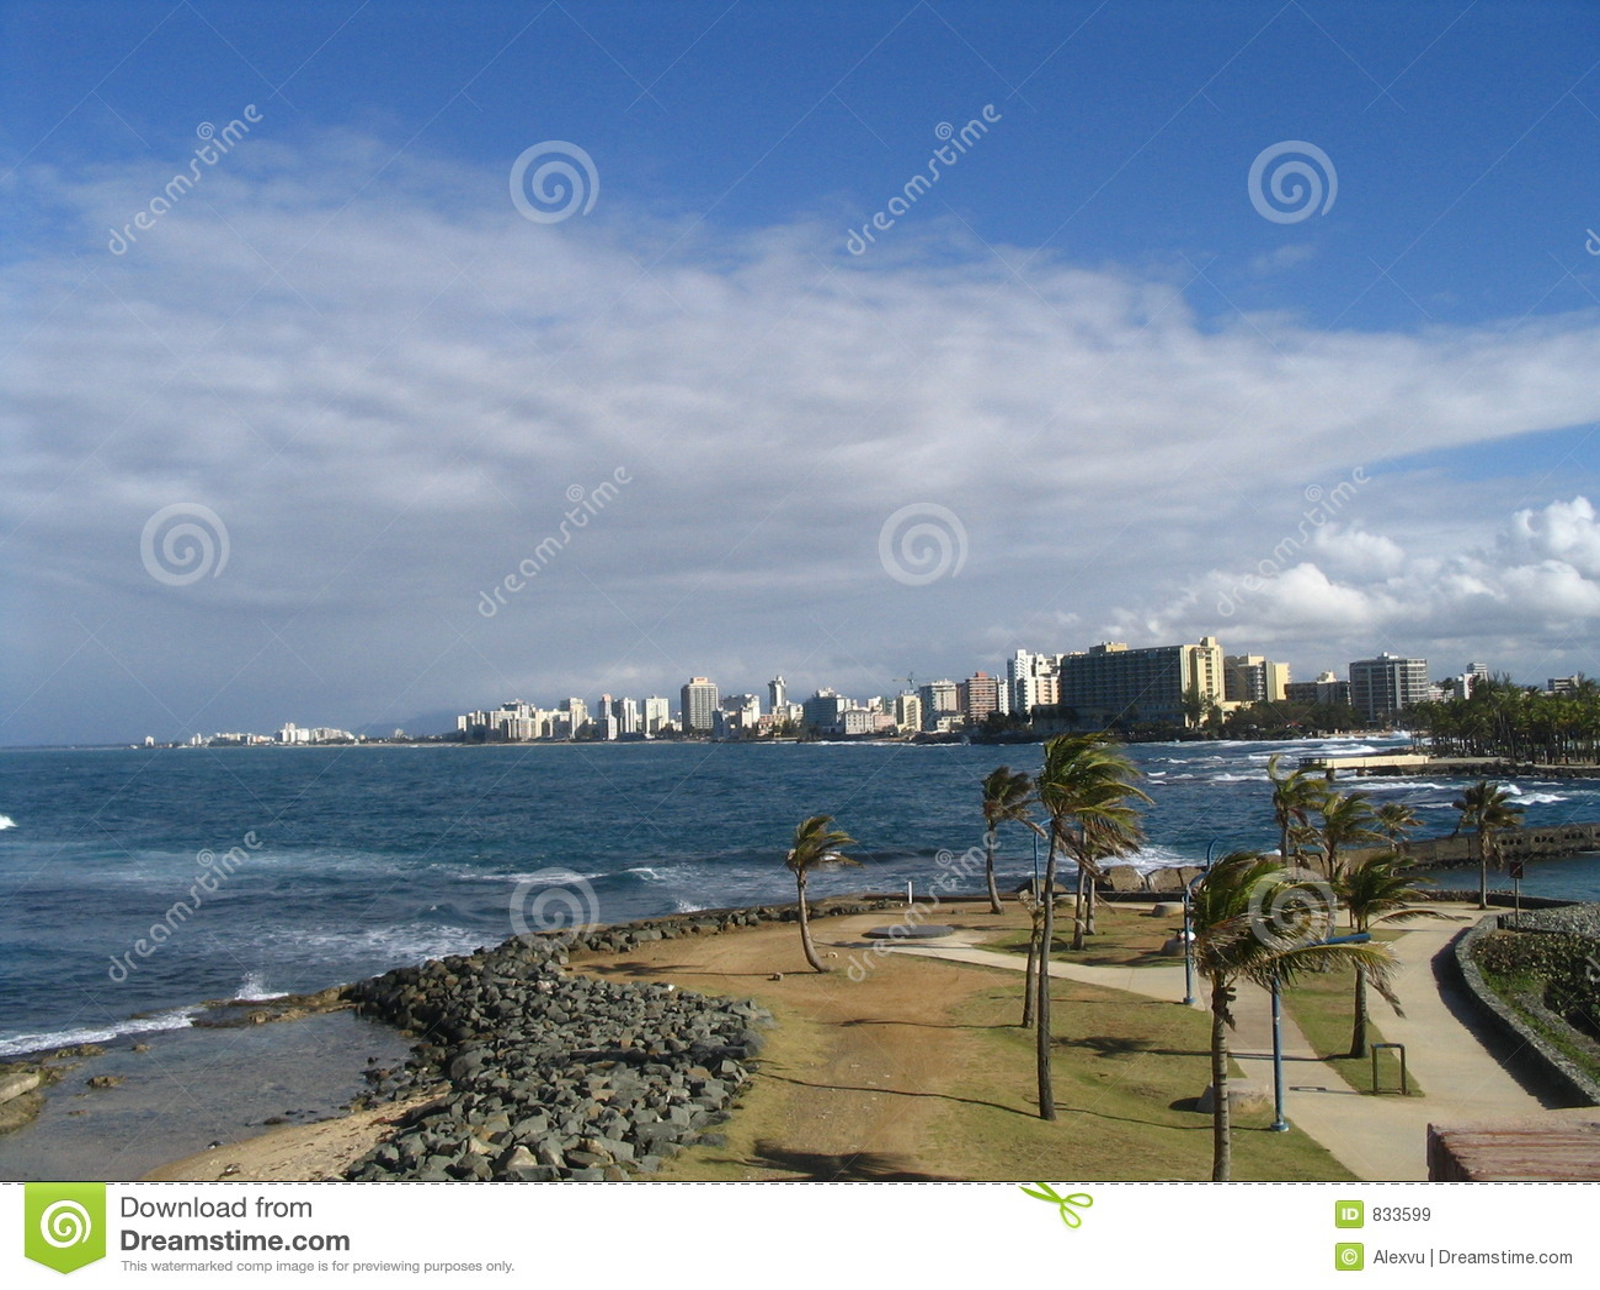 Beach at San Juan Puerto Rico